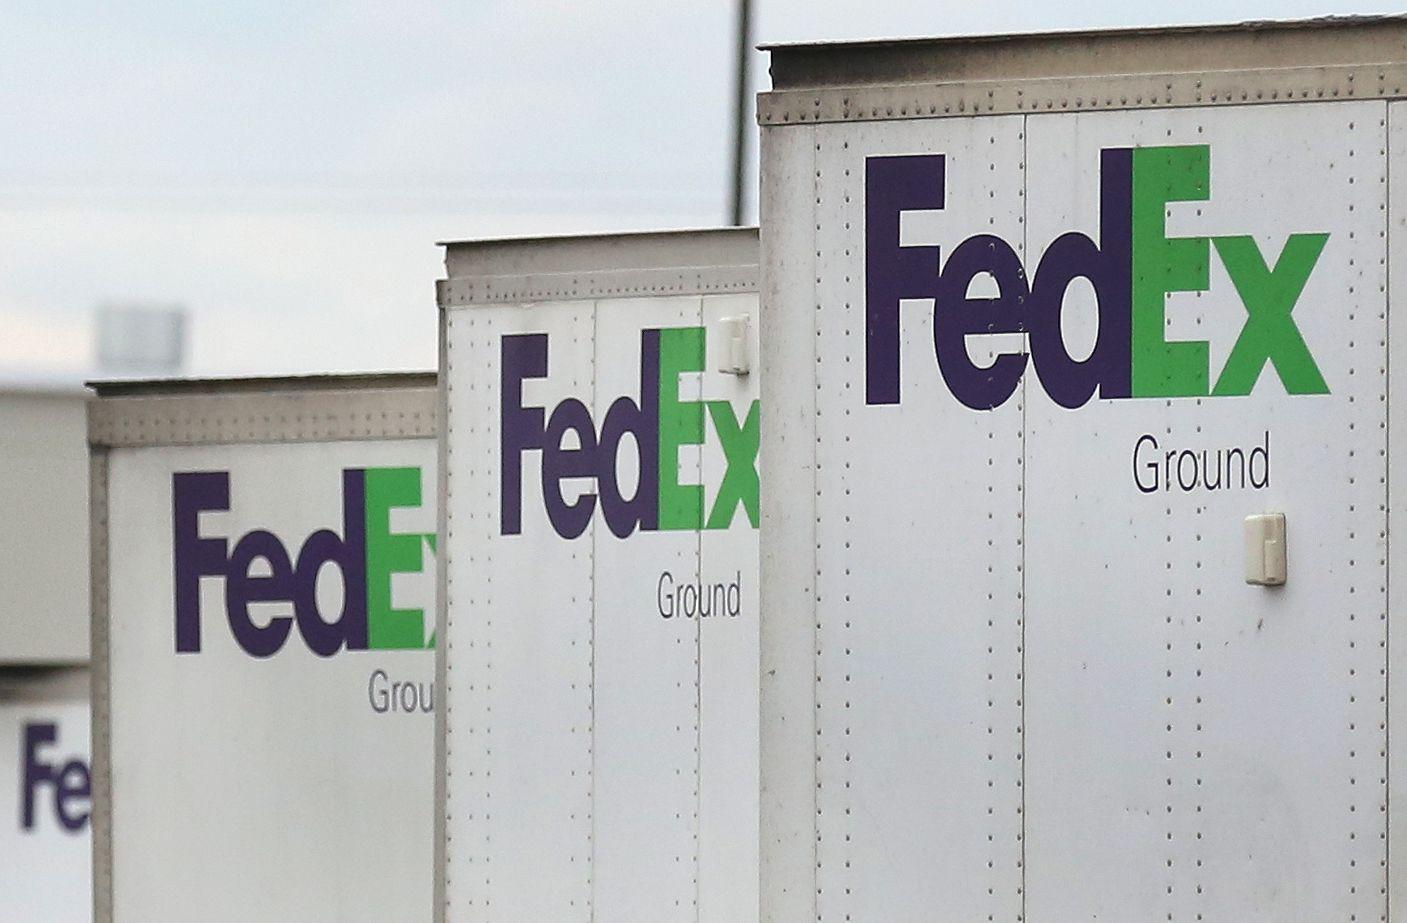 New FedEx hub lands on I-20 in Arlington near UPS' planned